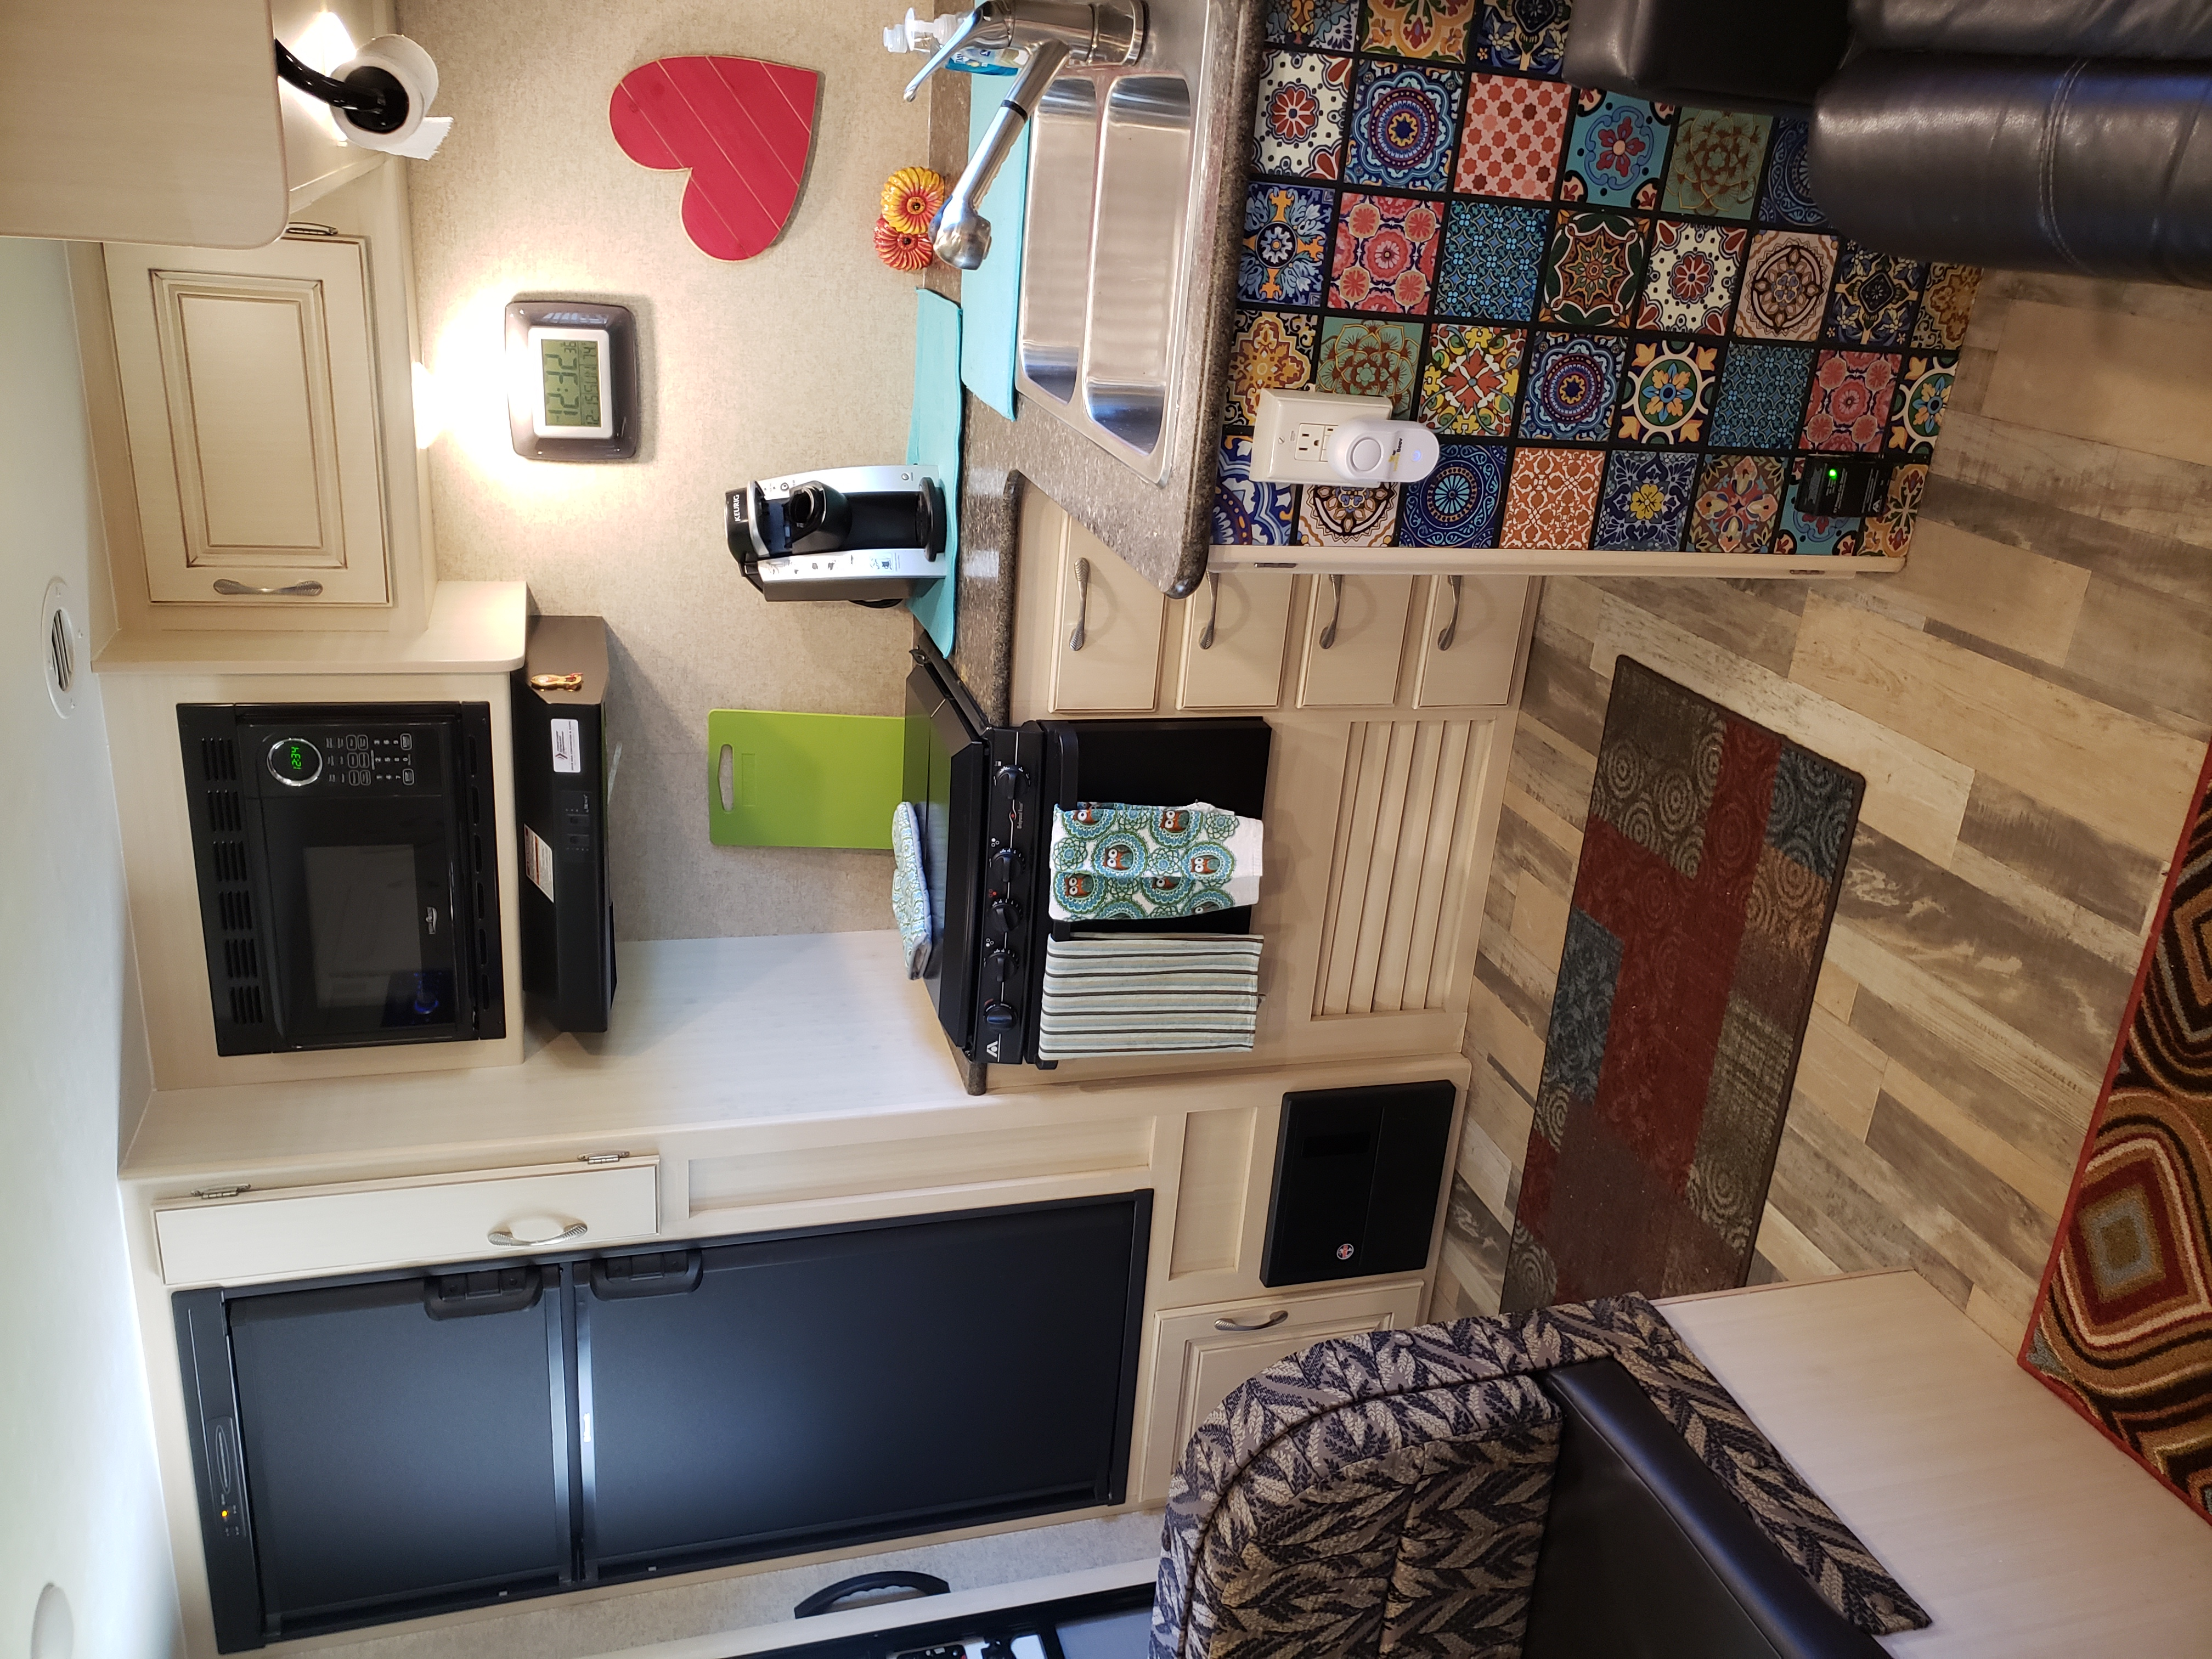 Dishes, cups, microwave, fridge, oven, stovetop, K-cup coffee pot,. Winnebago Minnie Winnie 2016